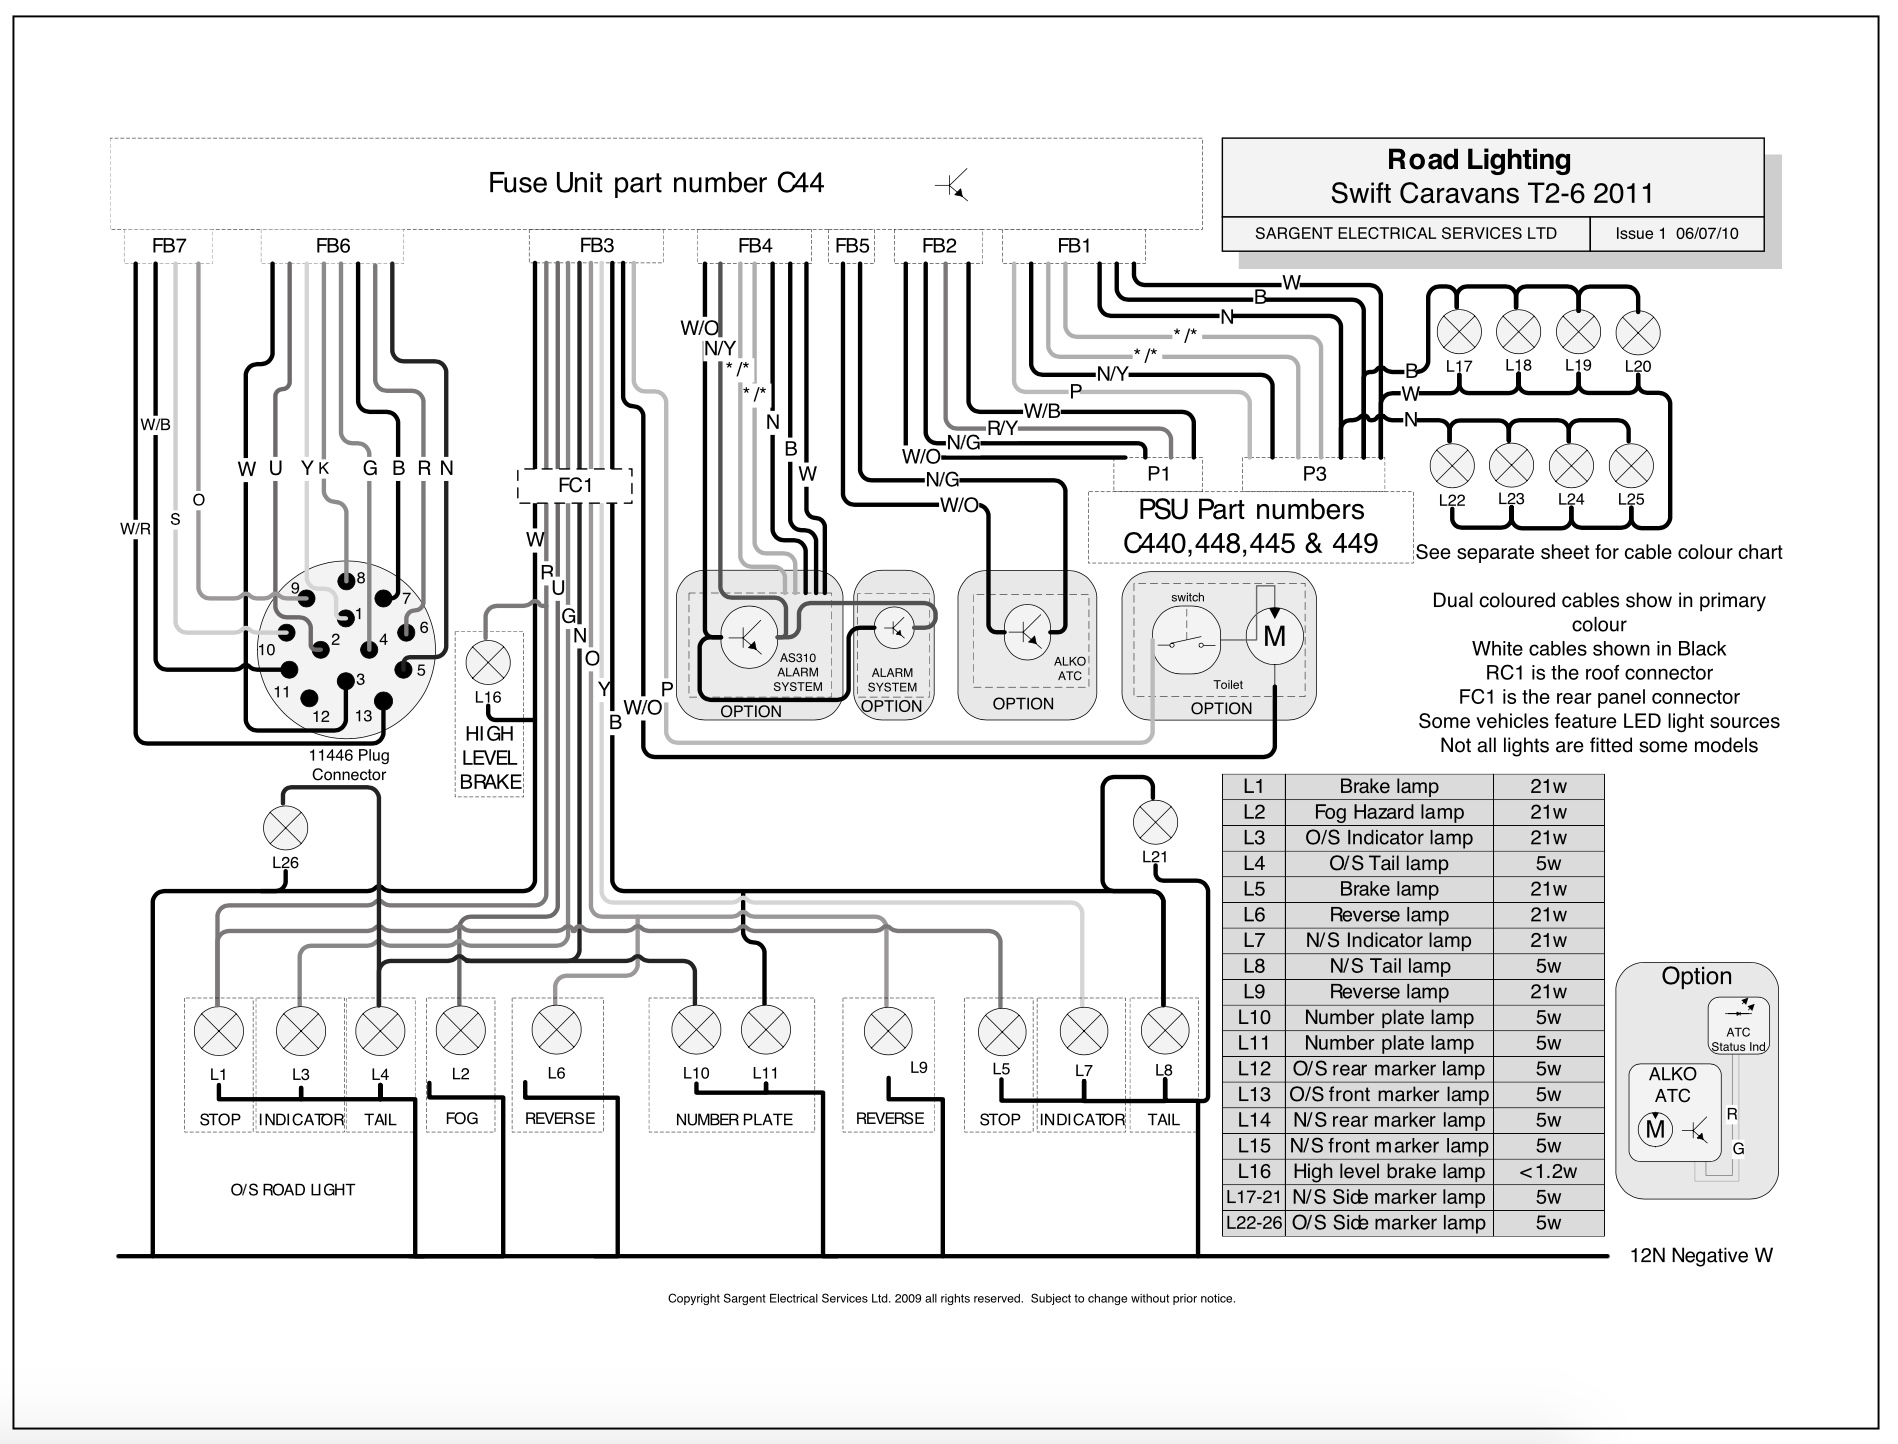 medium resolution of getting all charged up part 2 caravan chronicles swift caravan wiring diagram